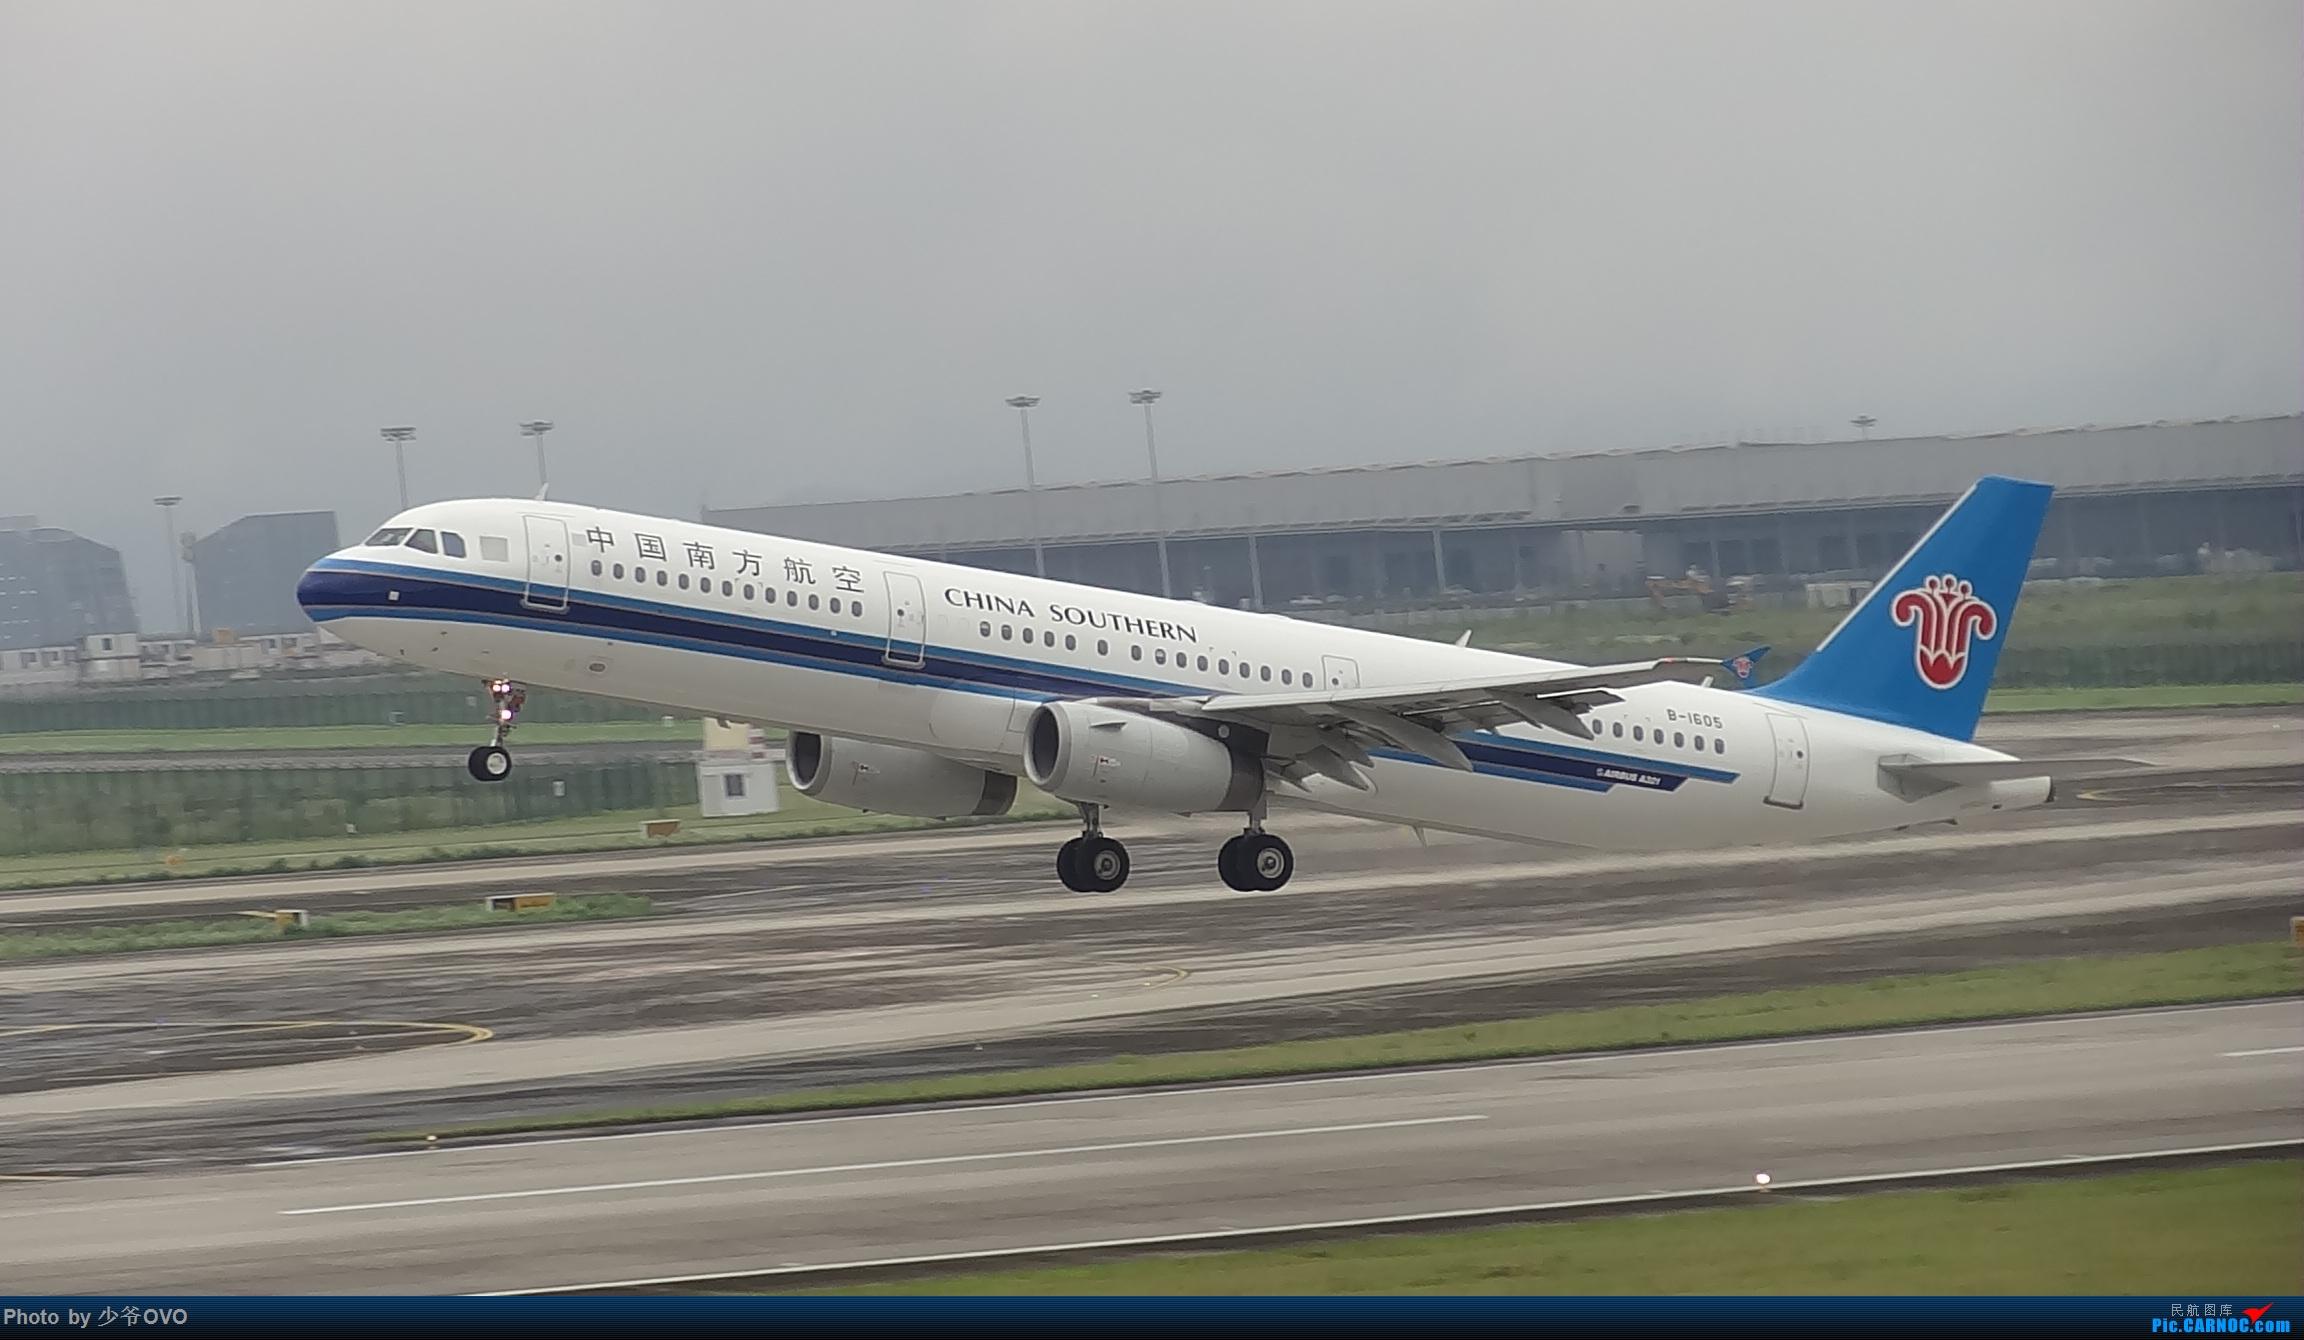 Re:[原创]CKG重庆江北机场拍机 ,中法建交50周年 AIRBUS A321-200 B-1605 中国重庆江北国际机场